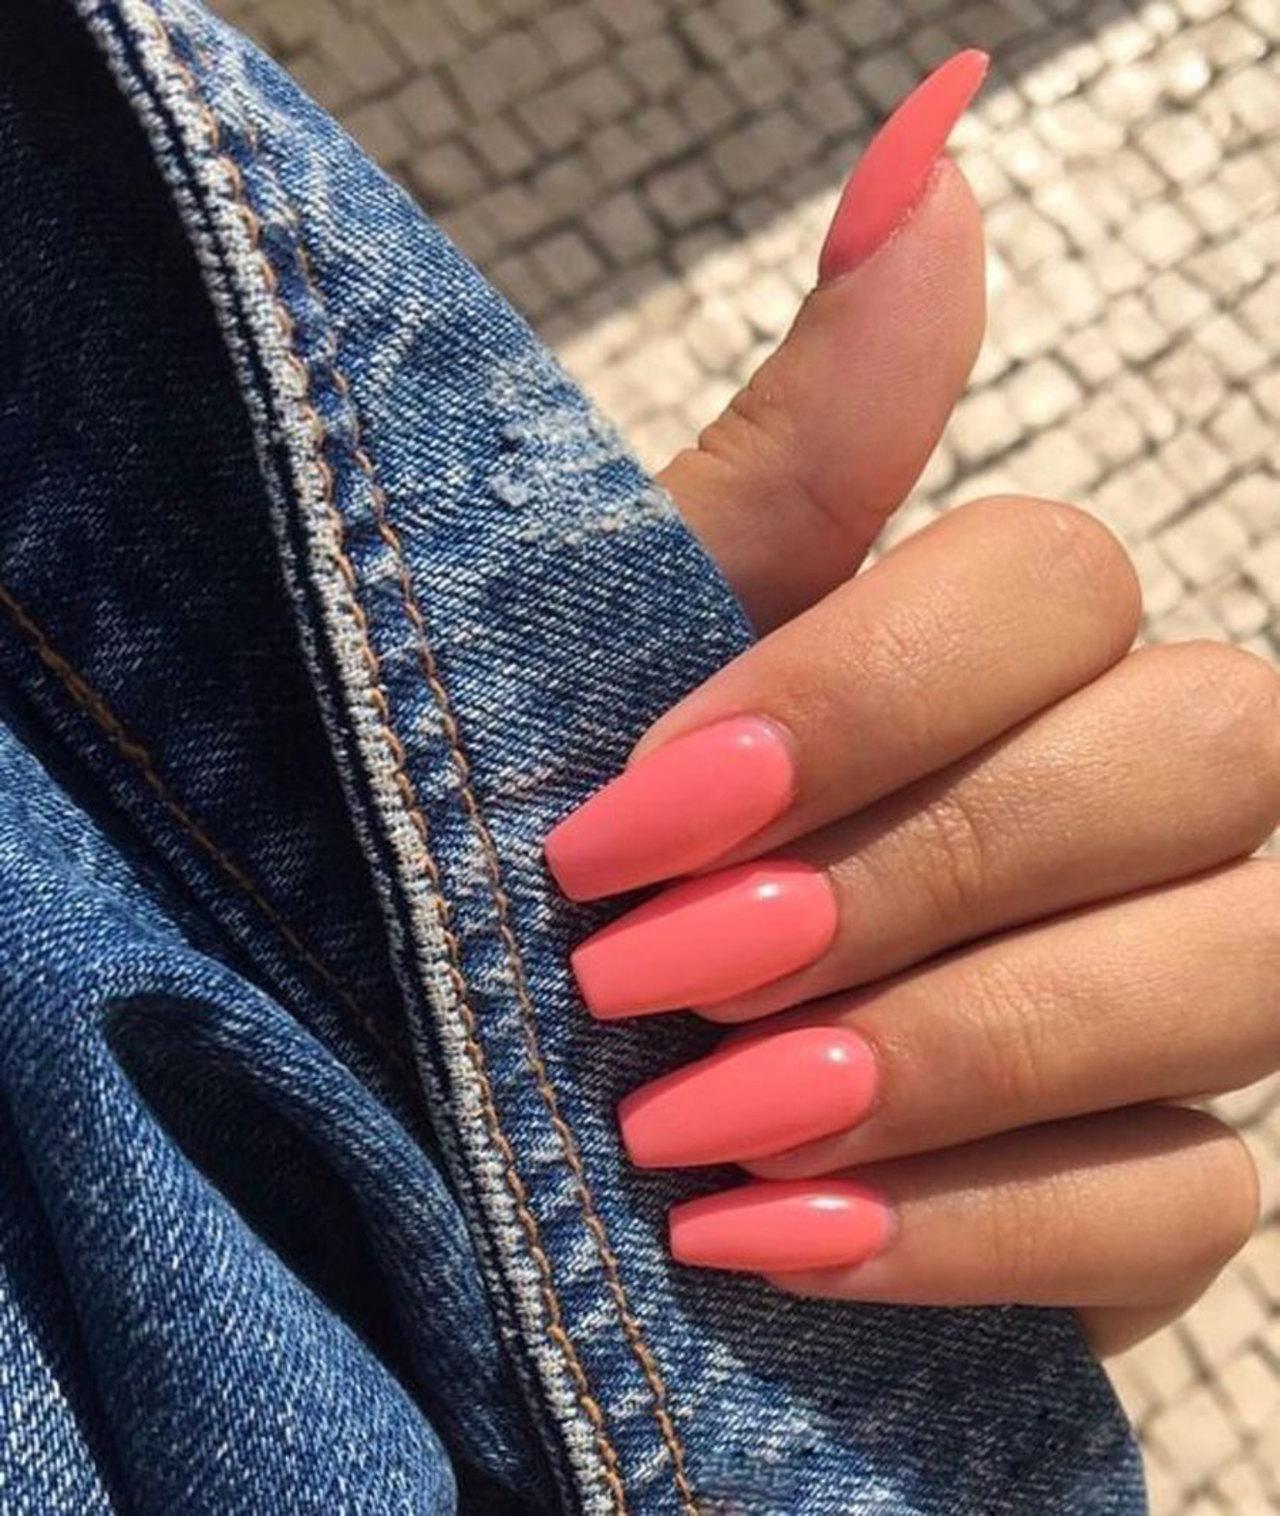 Moda en uñas este verano